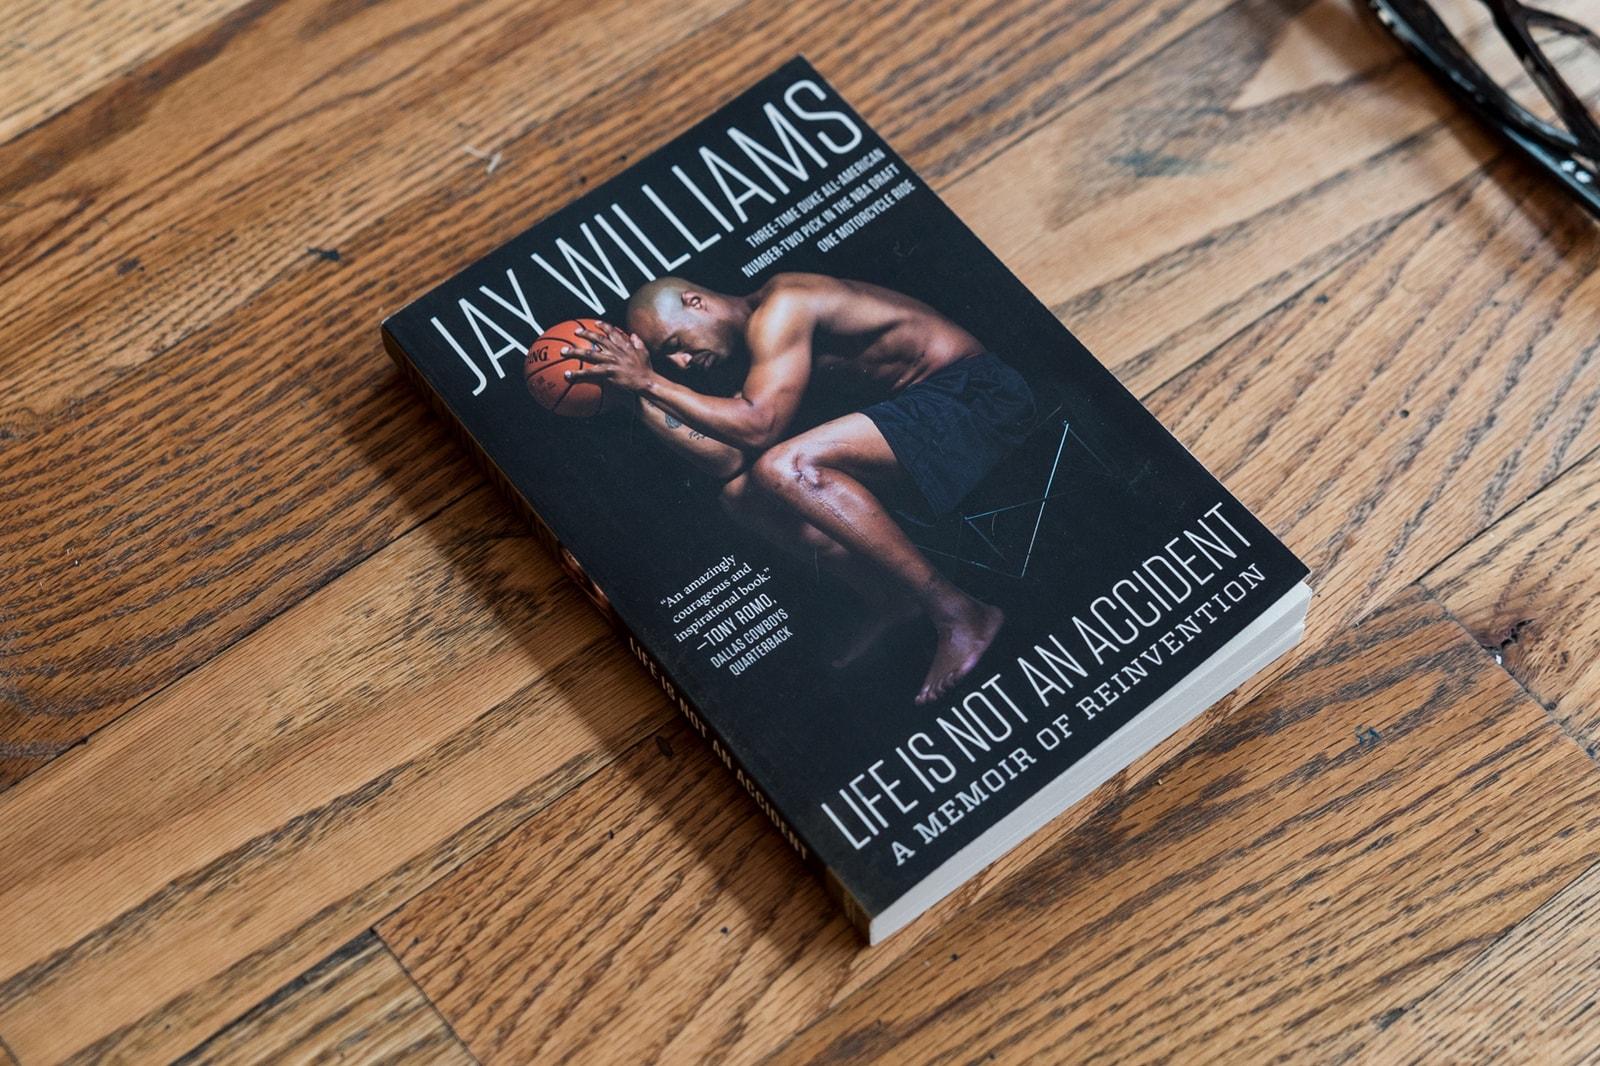 jay williams duke espn basketball nba college essentials hypebeast layoffs firings sports media journalist analyst